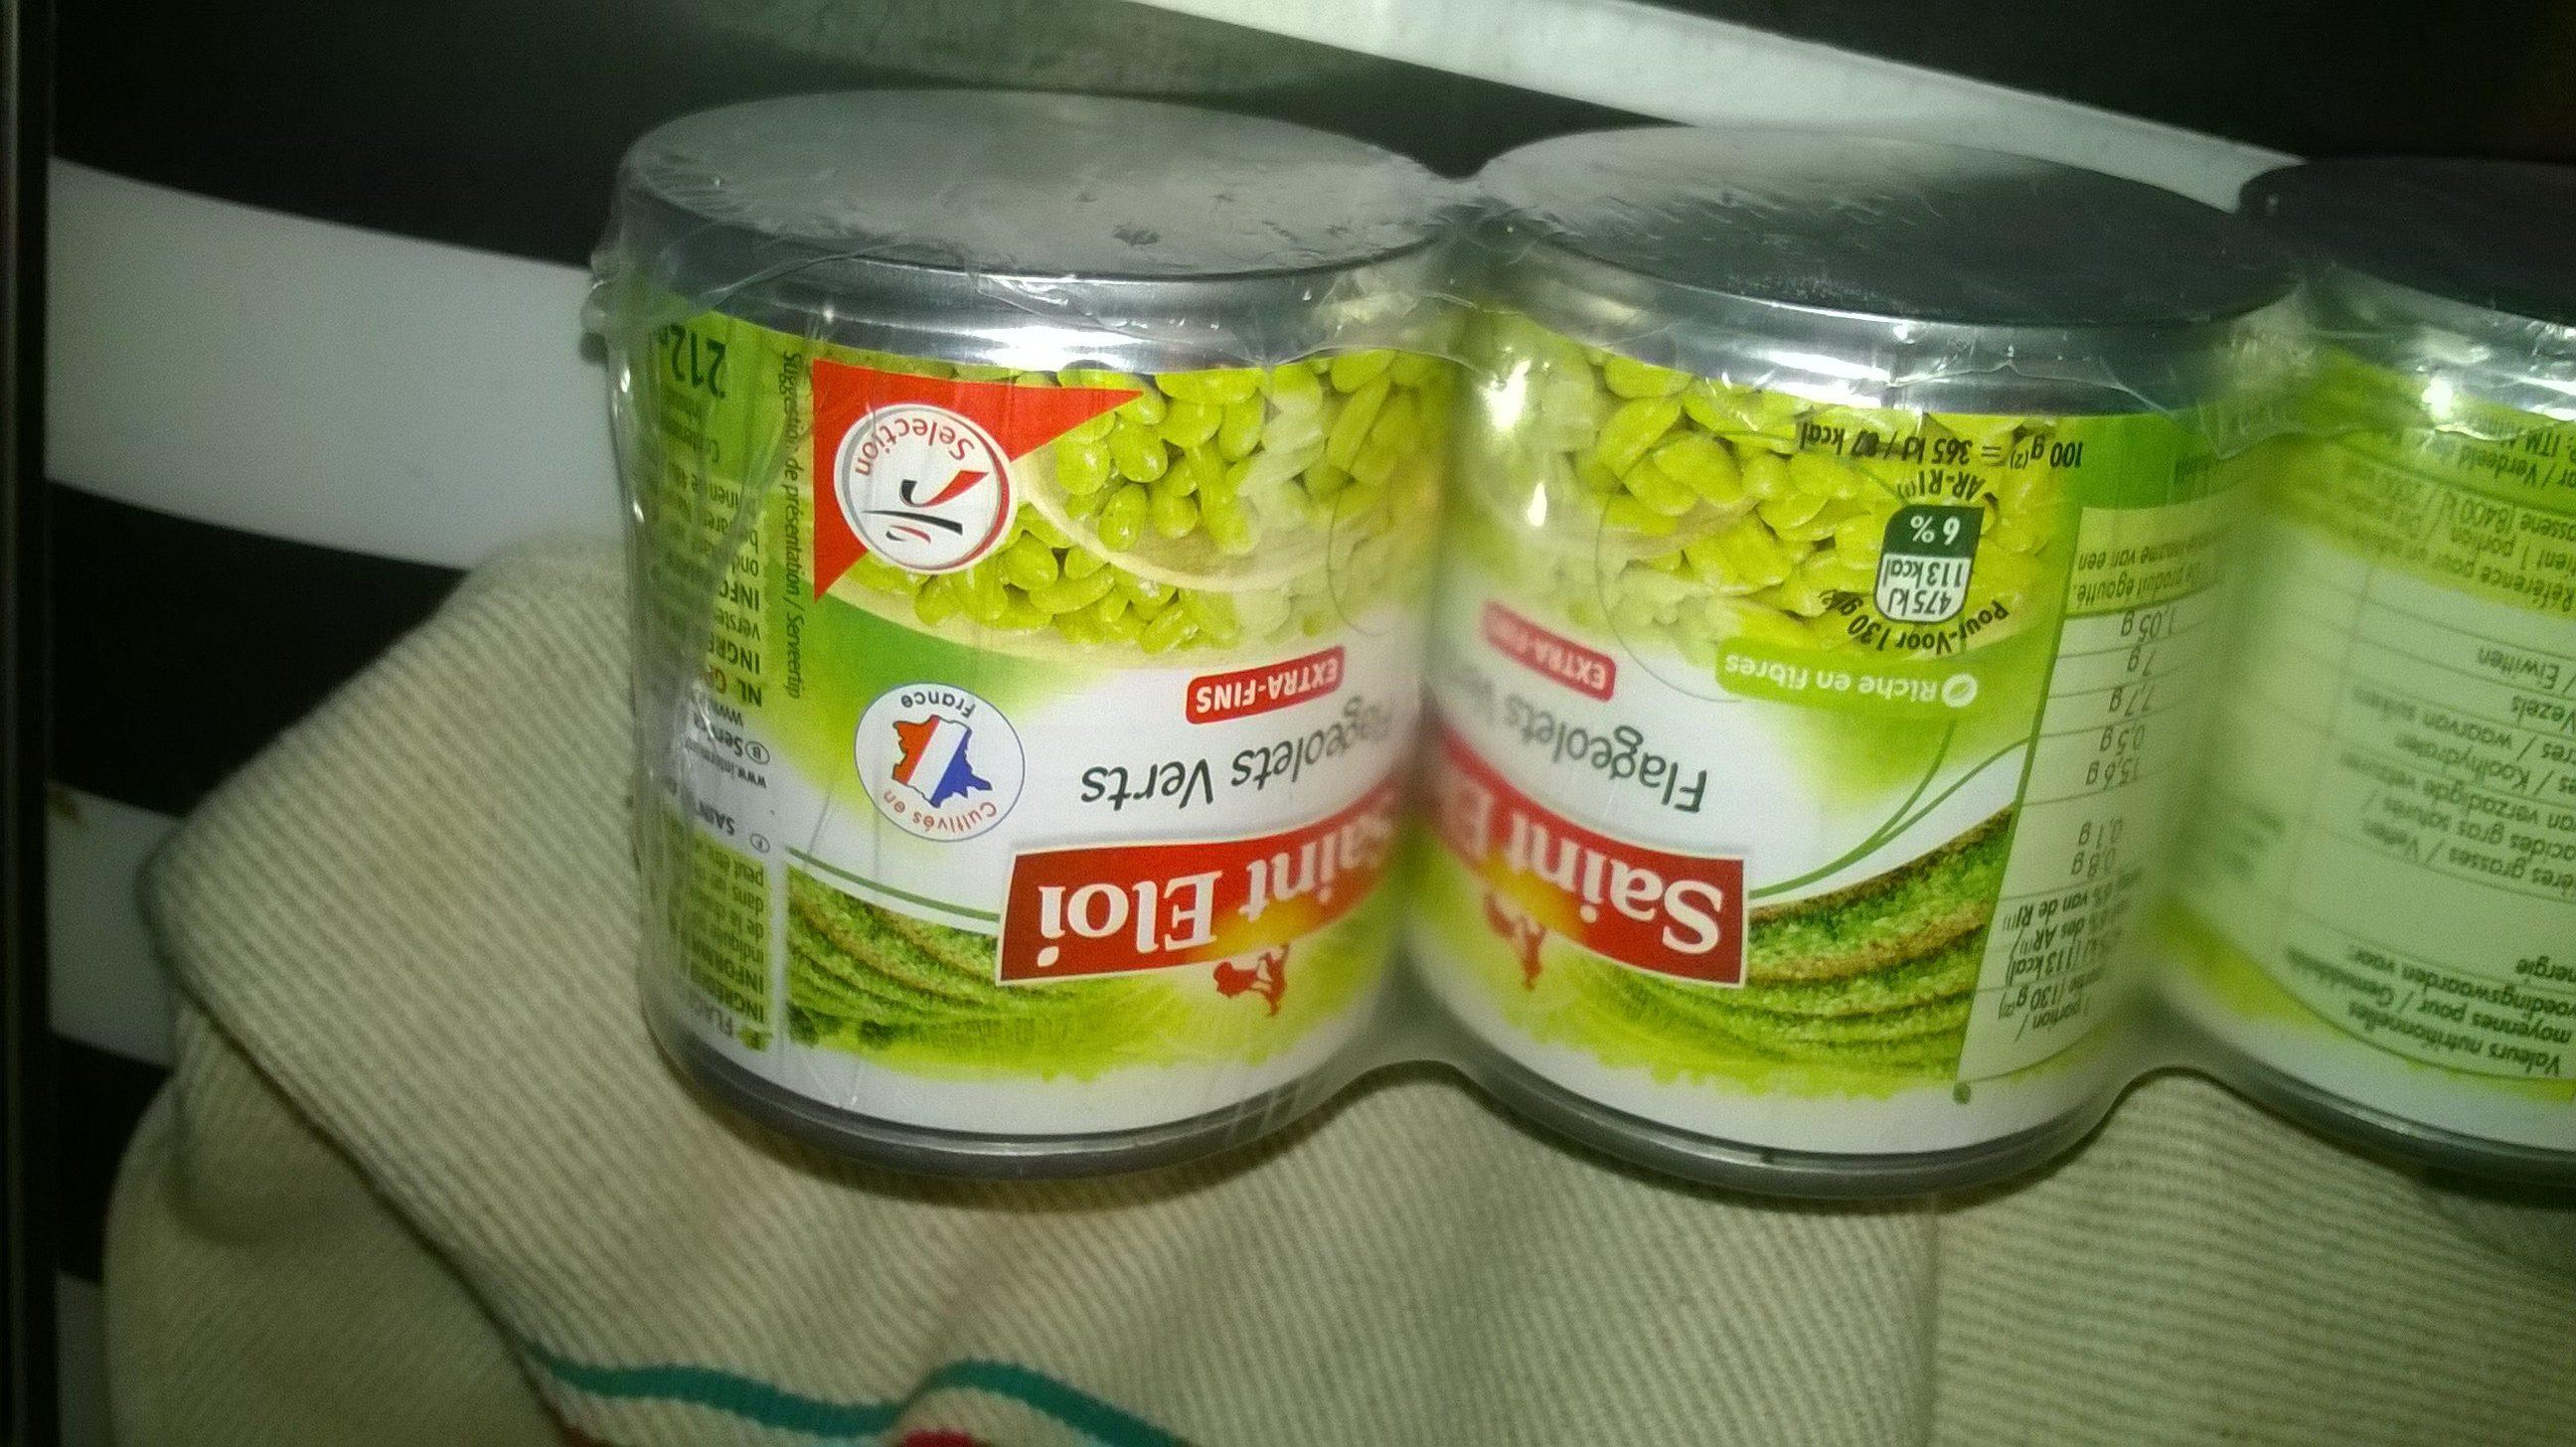 Flageolets verts extra fins, - Produit - fr